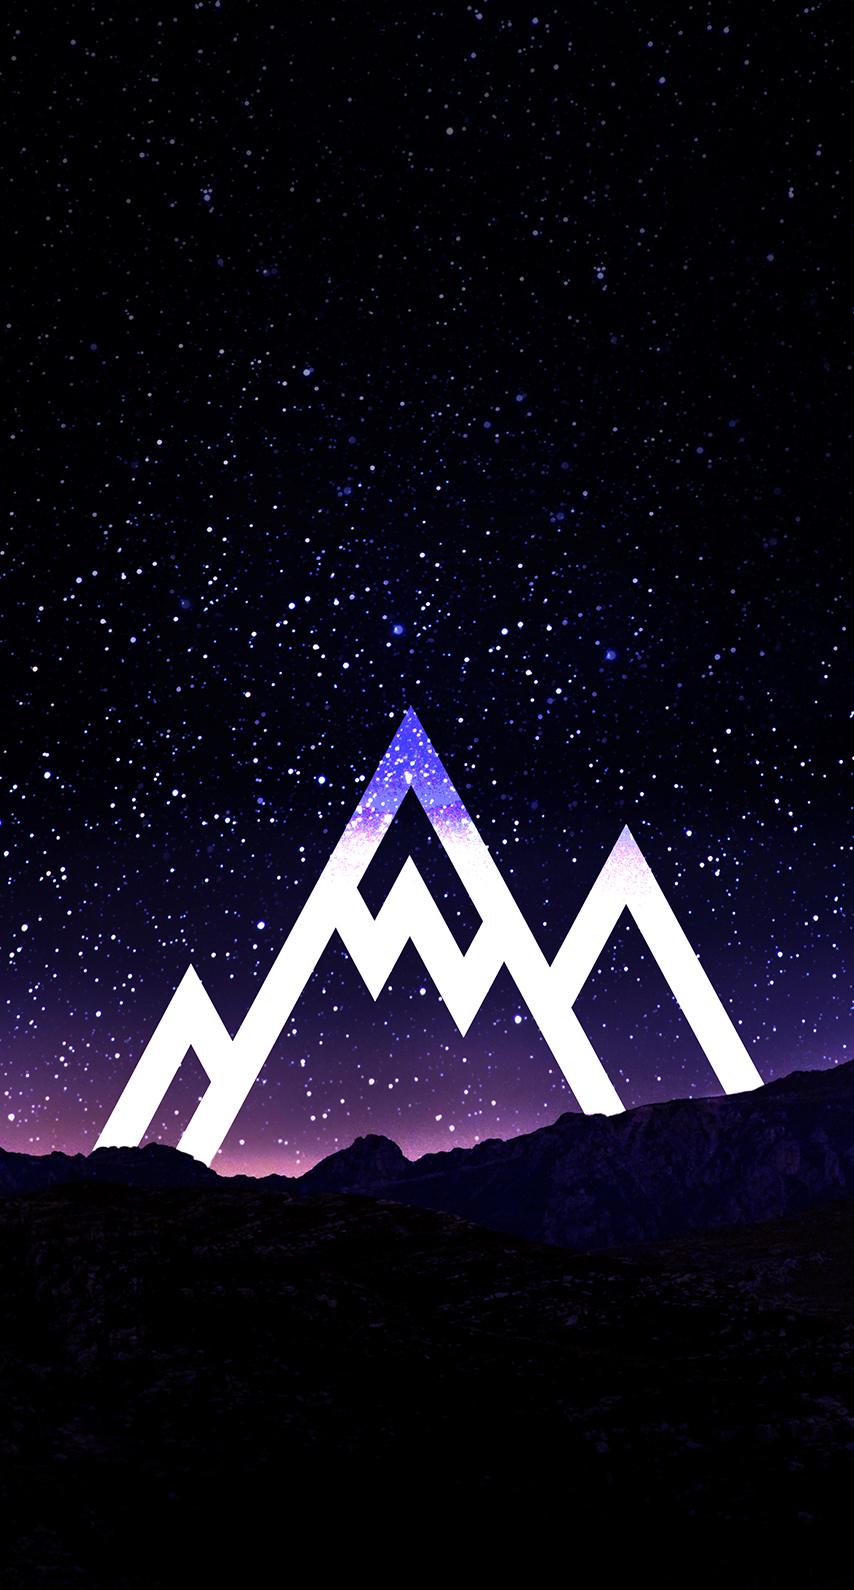 constellation, exploration